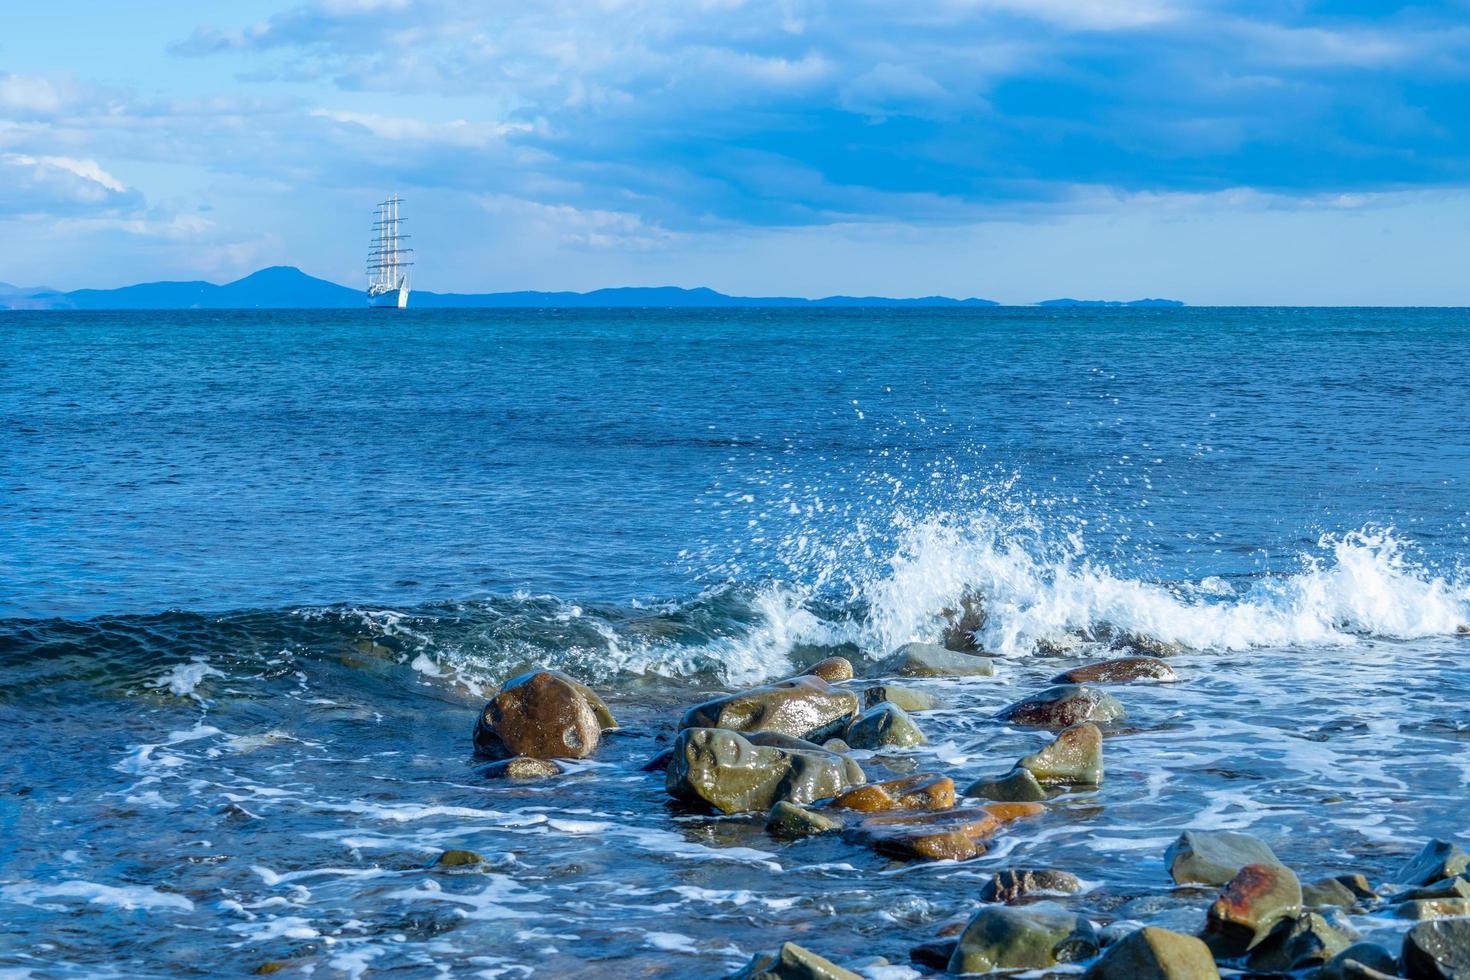 paisaje marino con un hermoso velero en el horizonte. foto